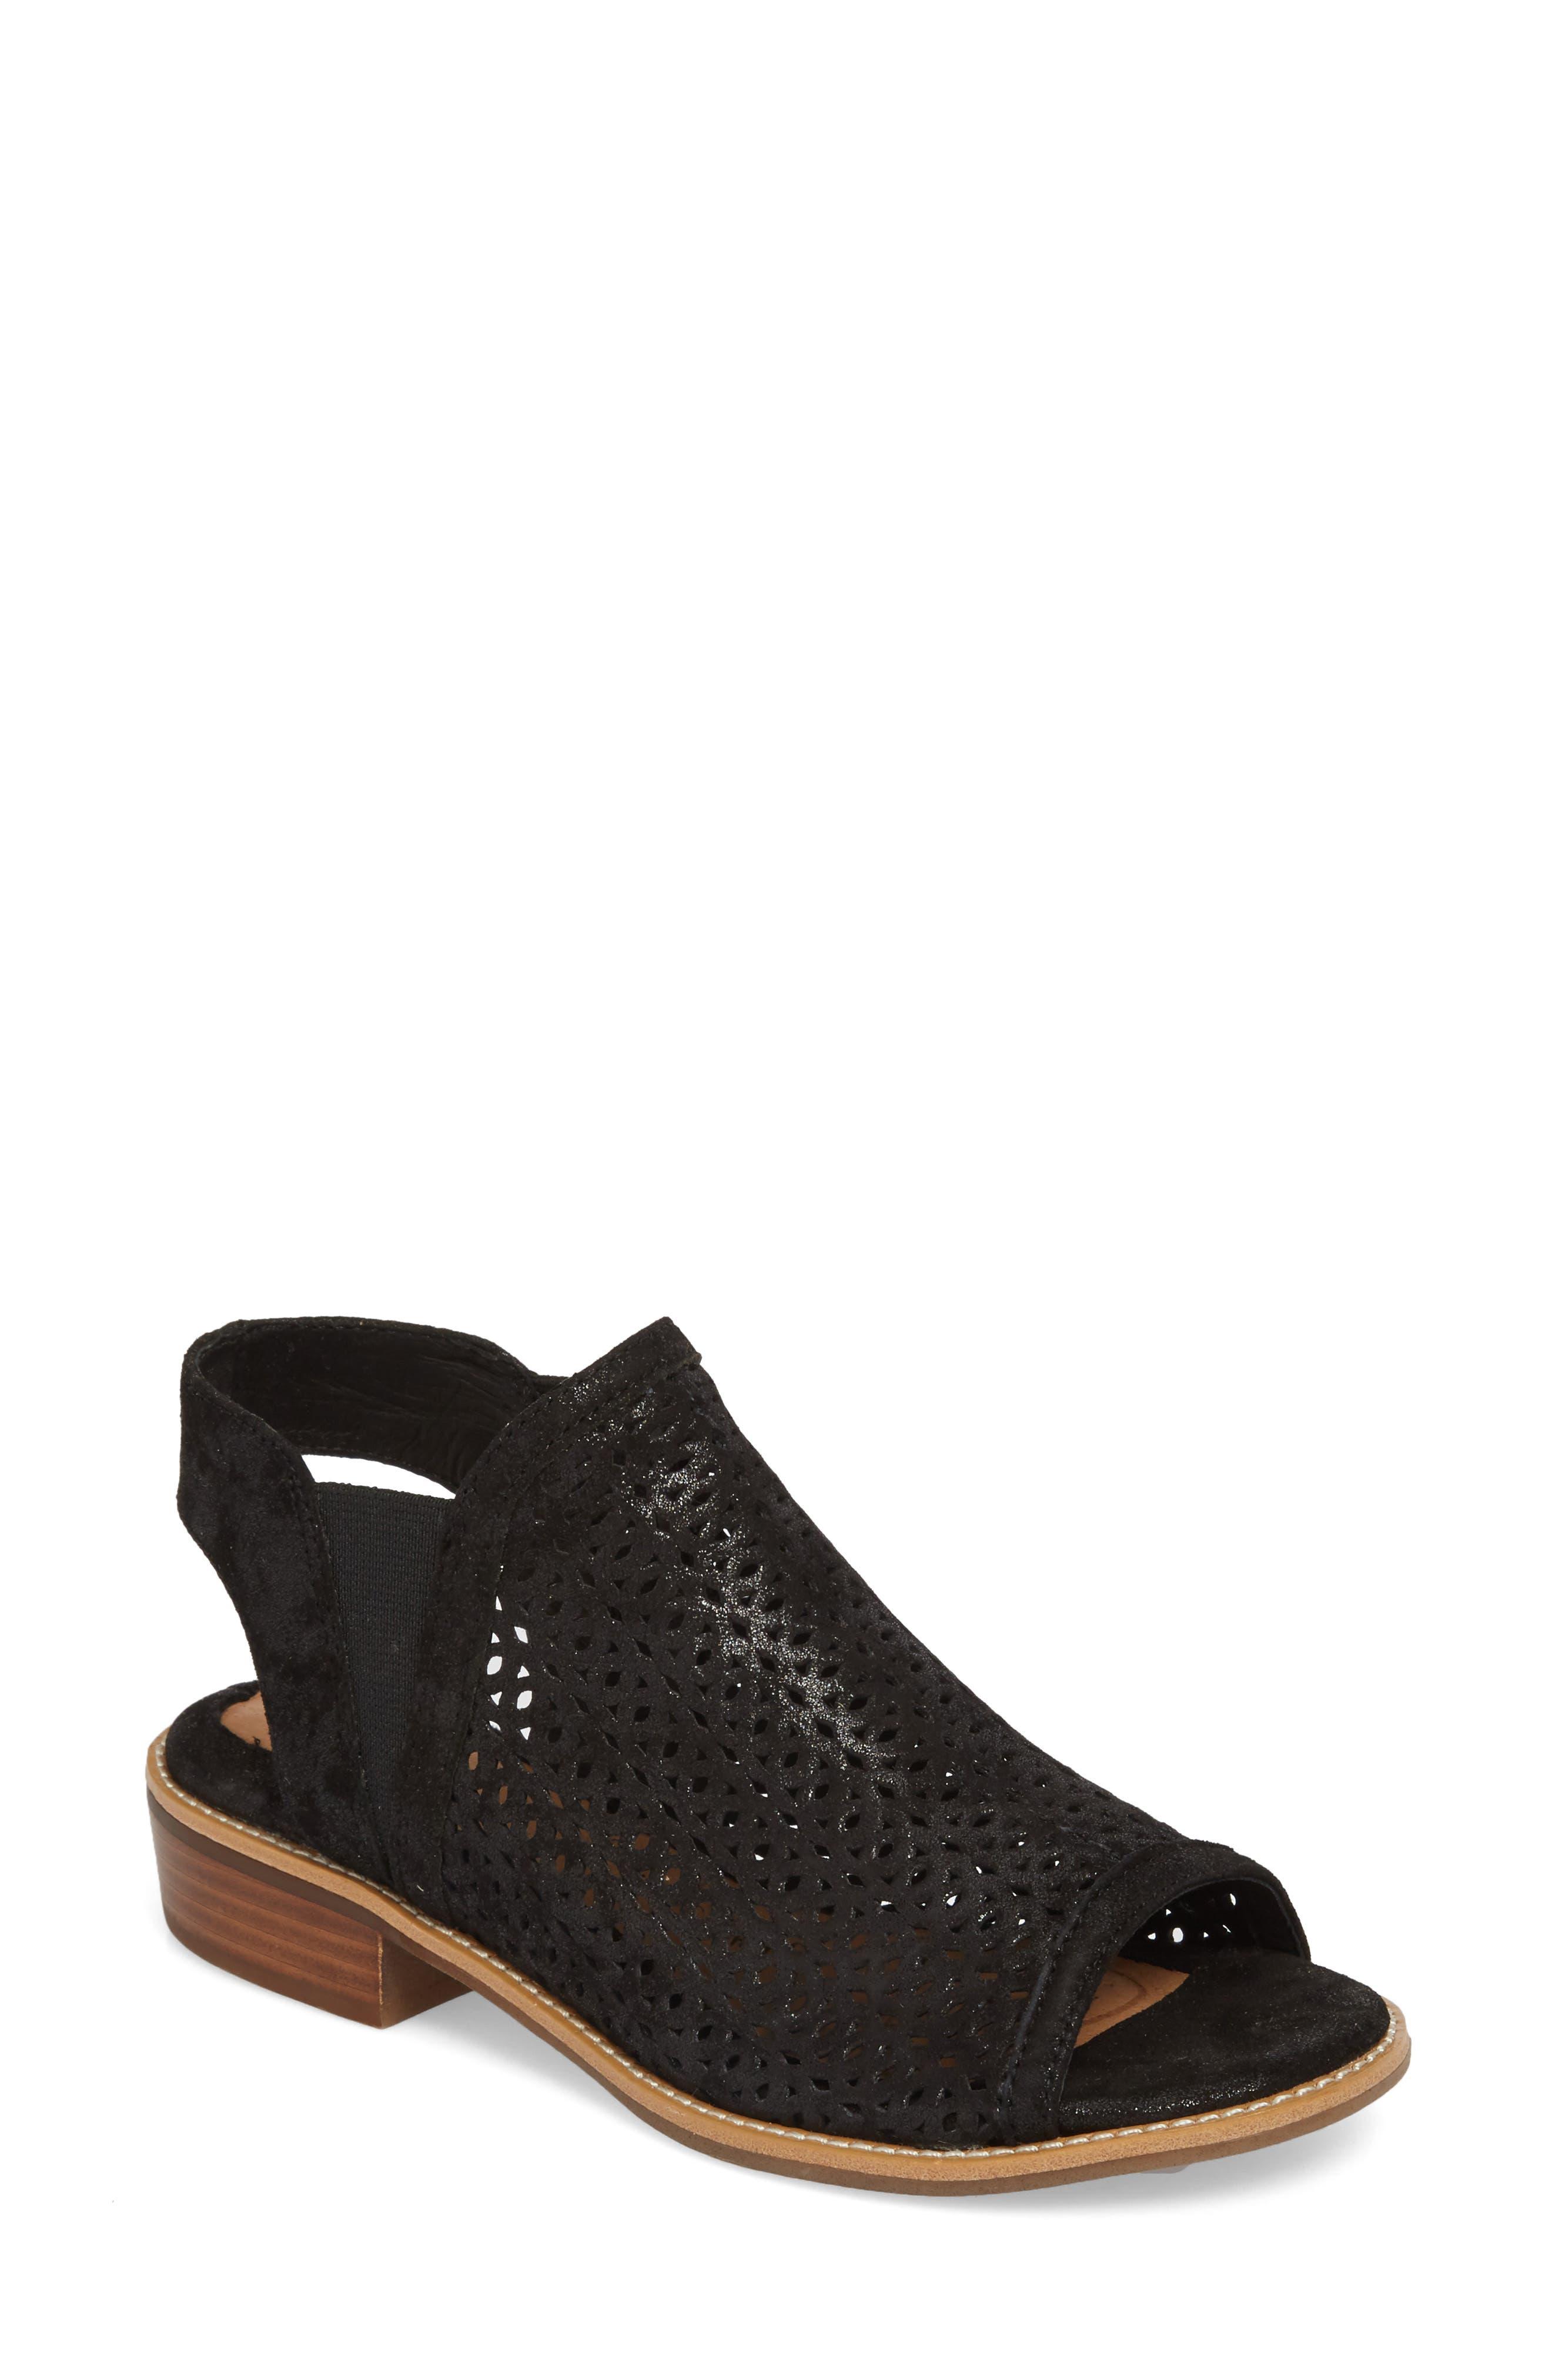 Nalda Sandal,                         Main,                         color, BLACK LEATHER